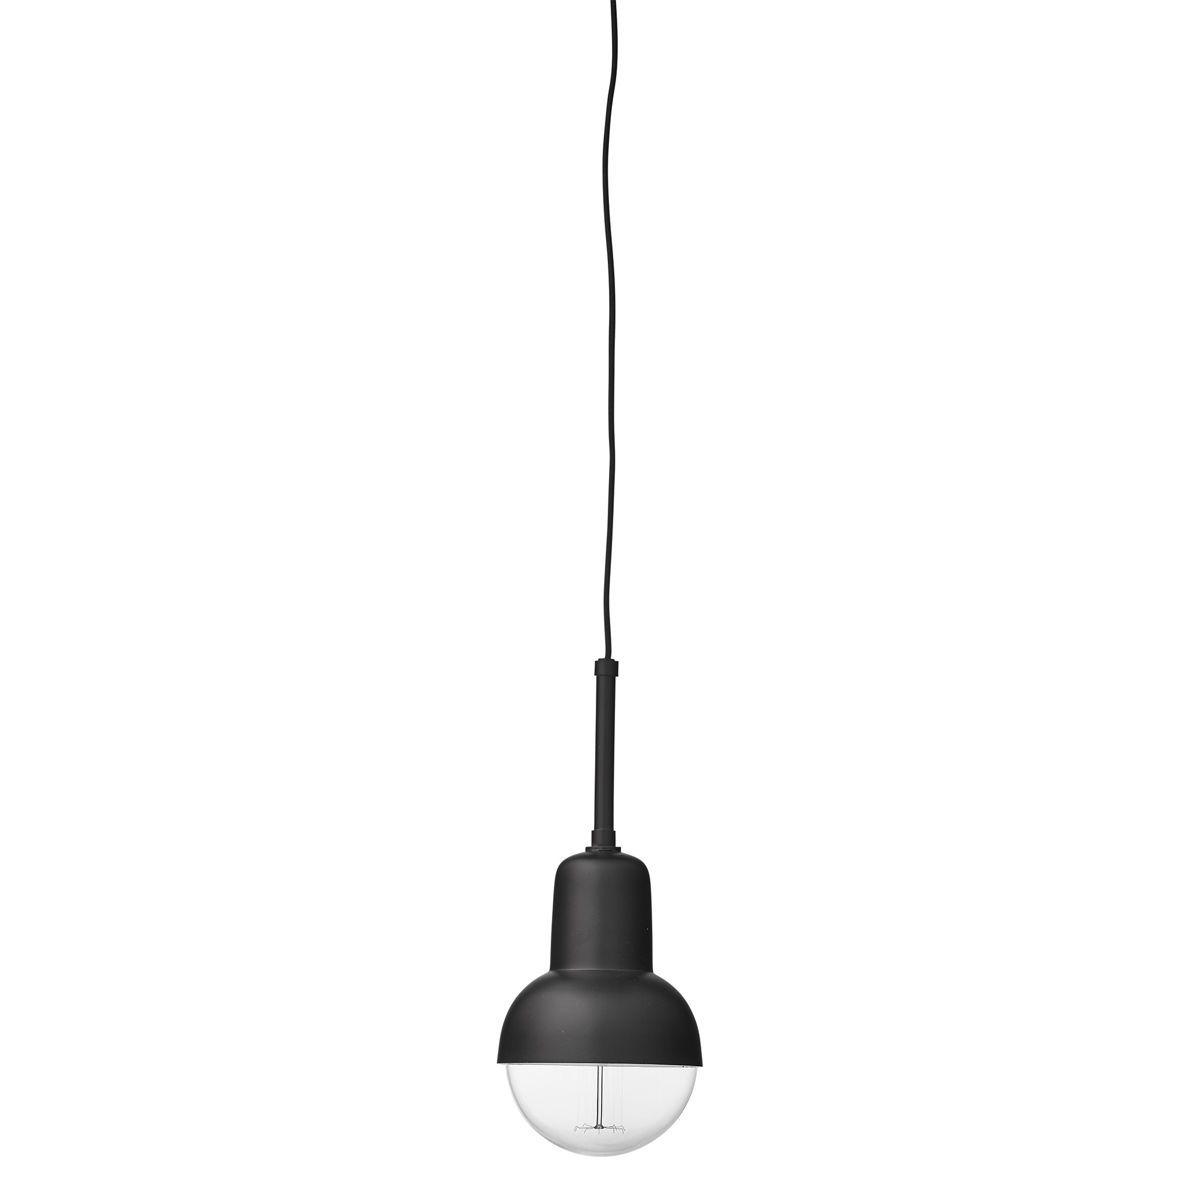 Lampa Carmela Pendant Black A00002992 Lene Bjerre A W